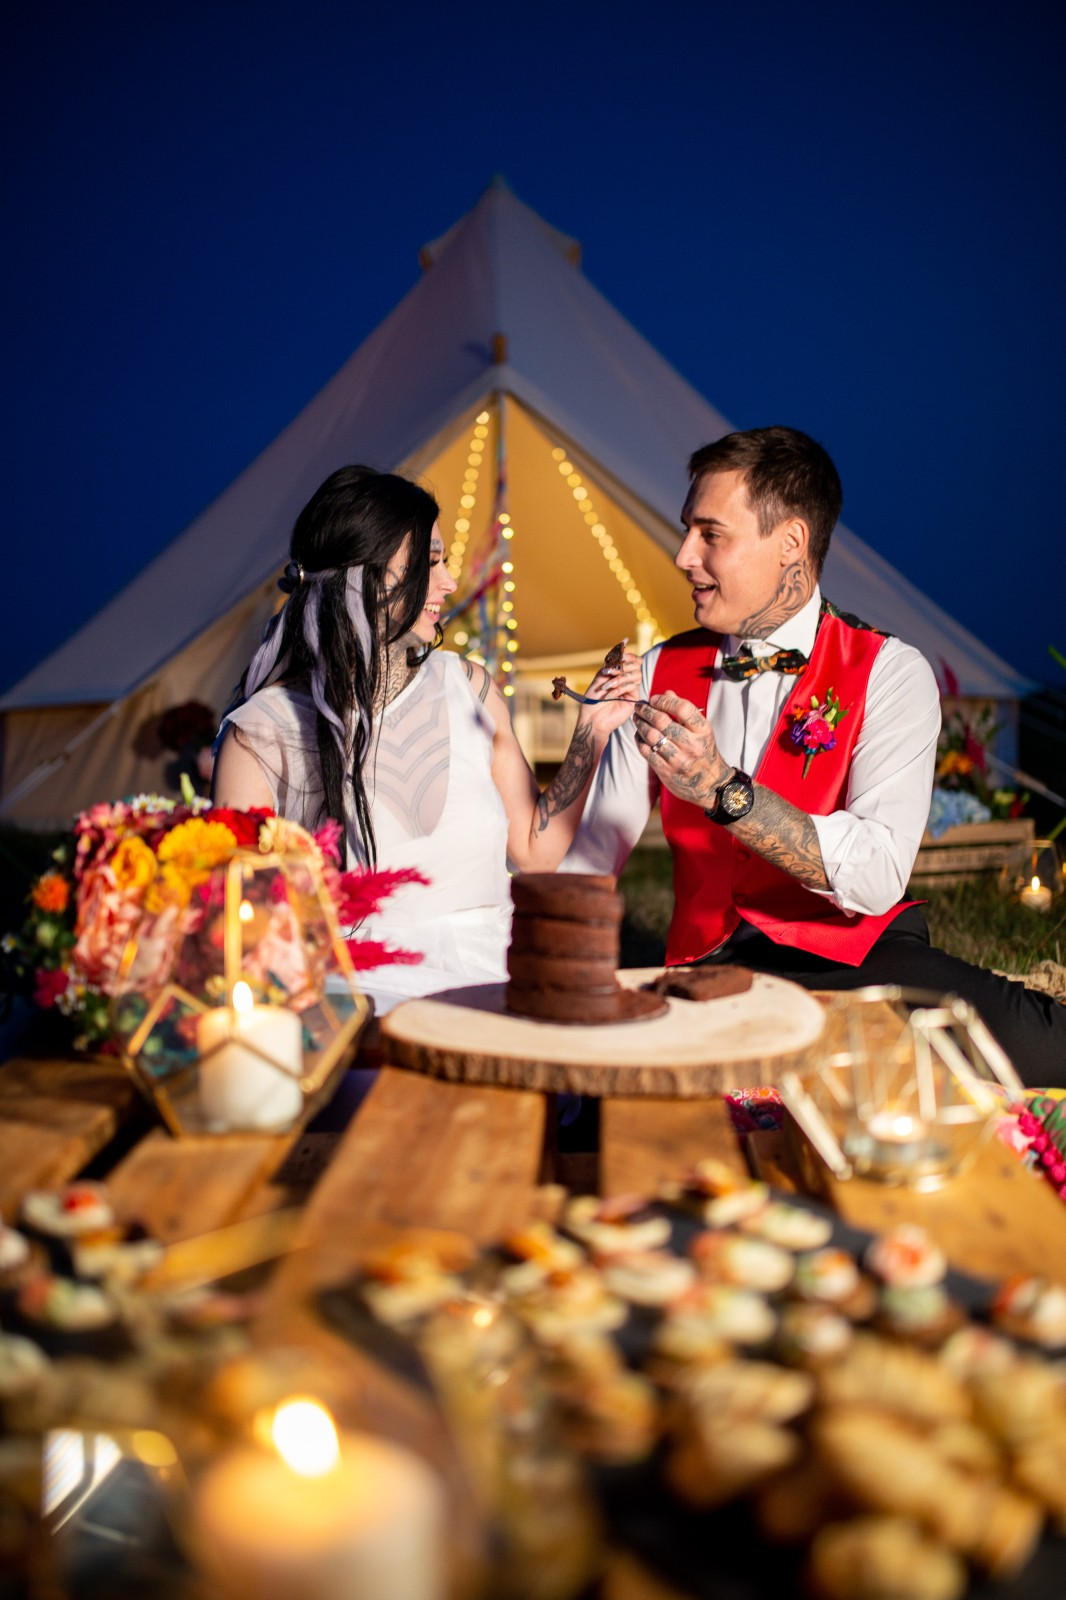 rainbow festival wedding - colourful wedding - quirky wedding ideas - tipi wedding - bride and groom eating cake